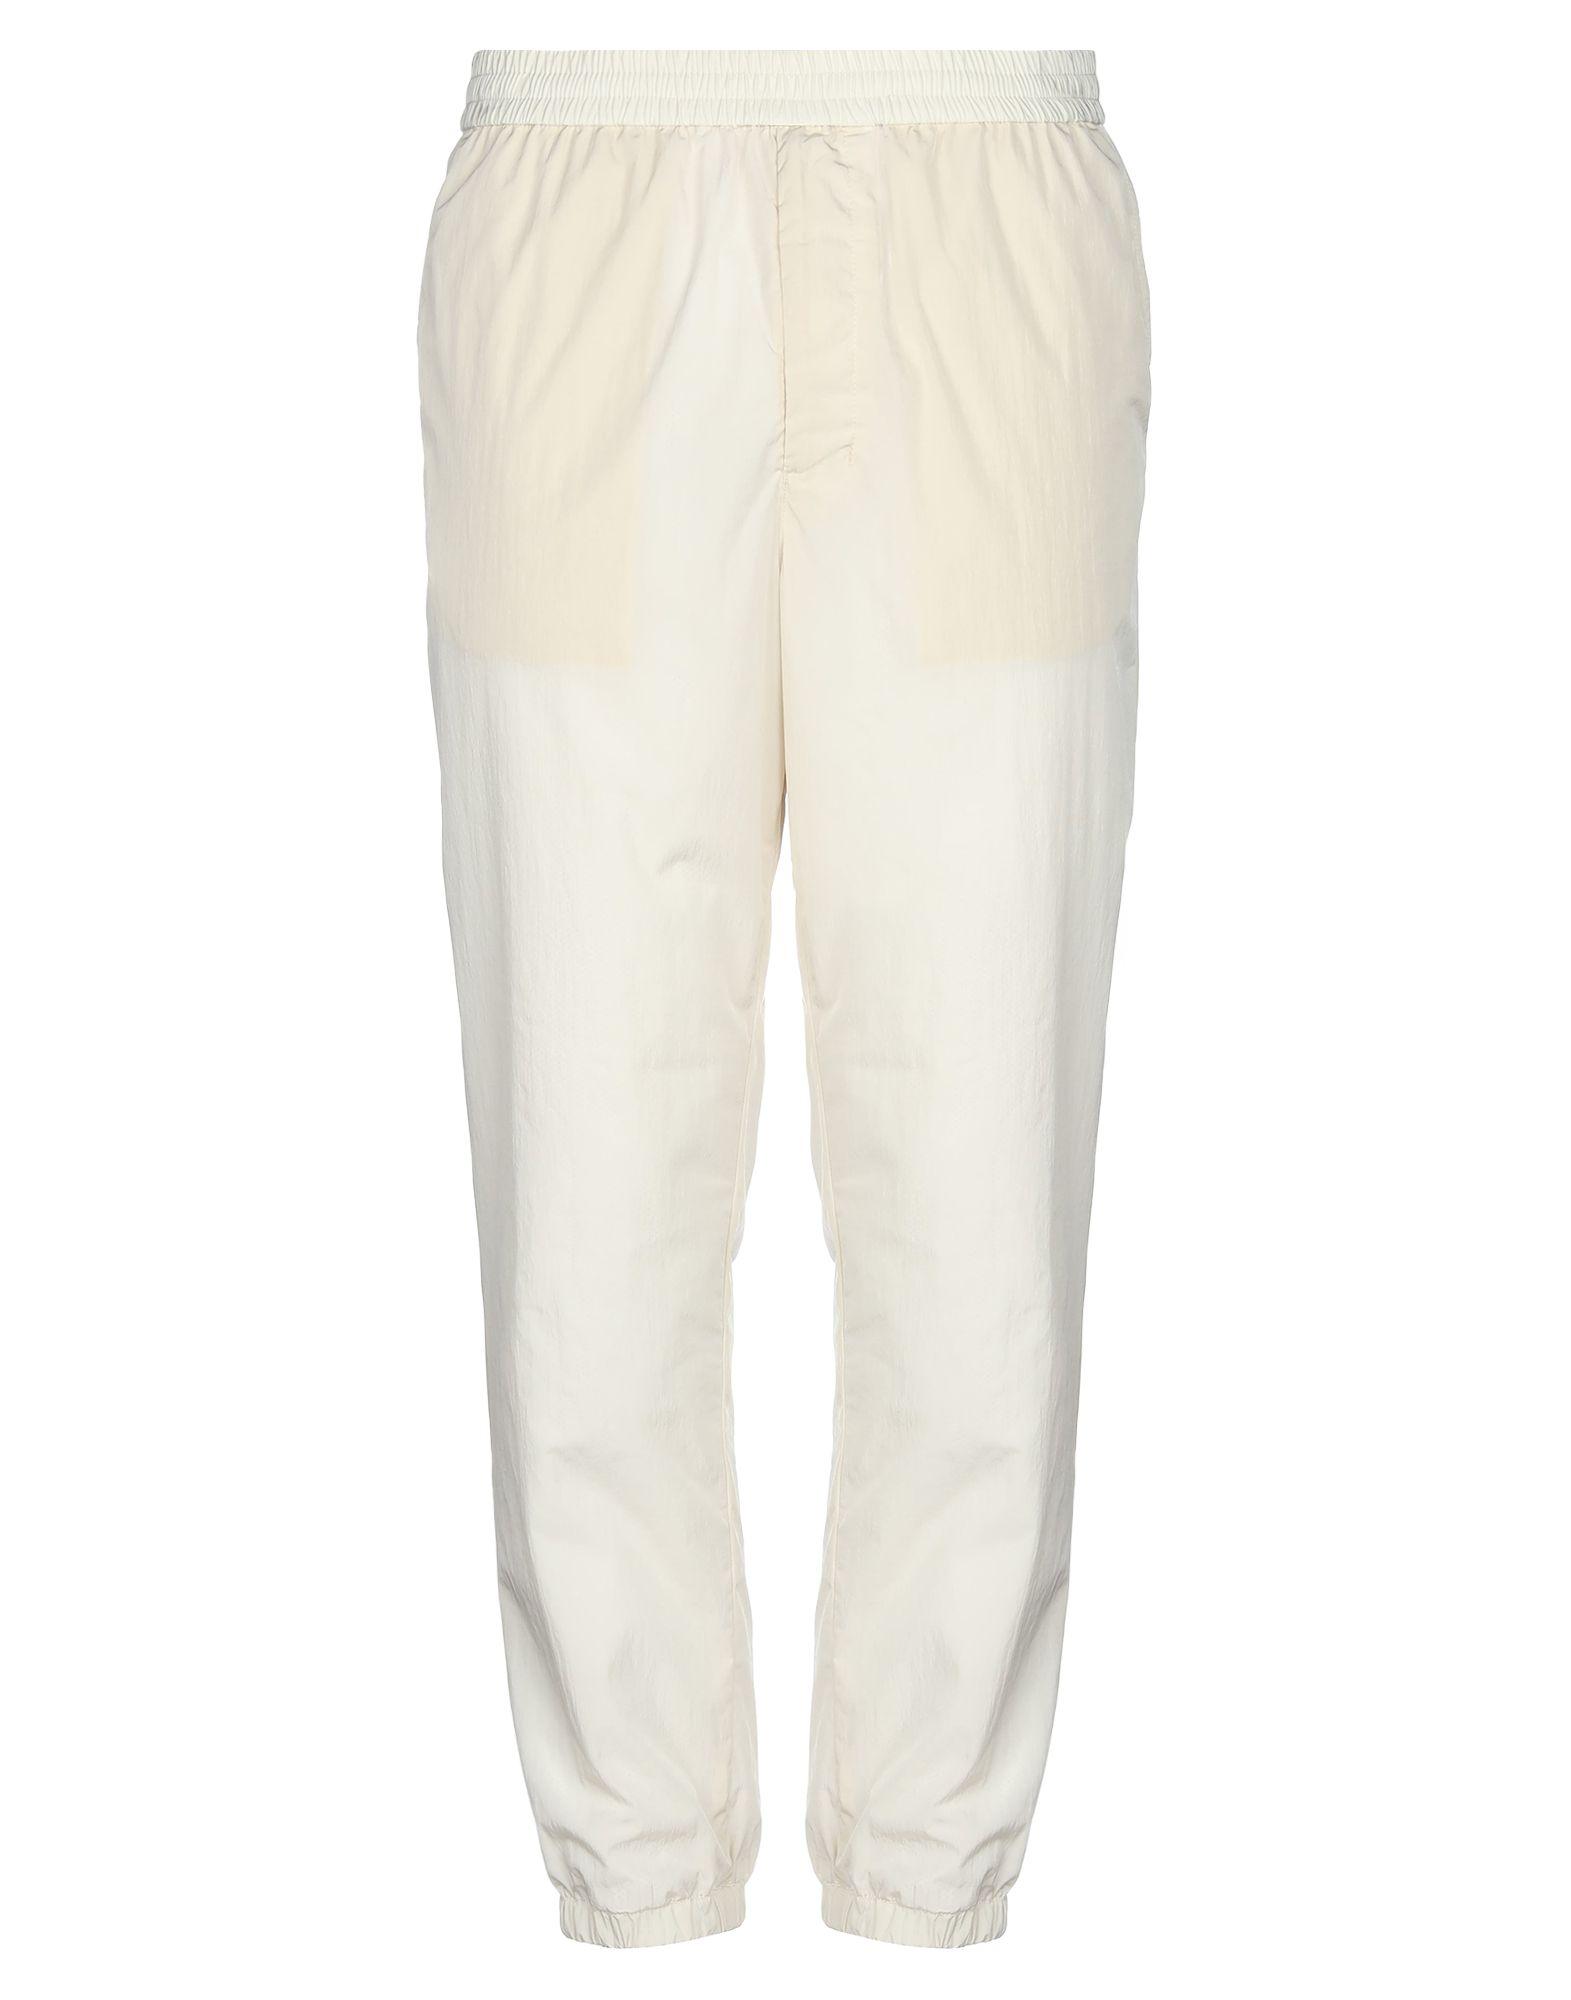 Фото - AMI ALEXANDRE MATTIUSSI Повседневные брюки ami alexandre mattiussi повседневные брюки